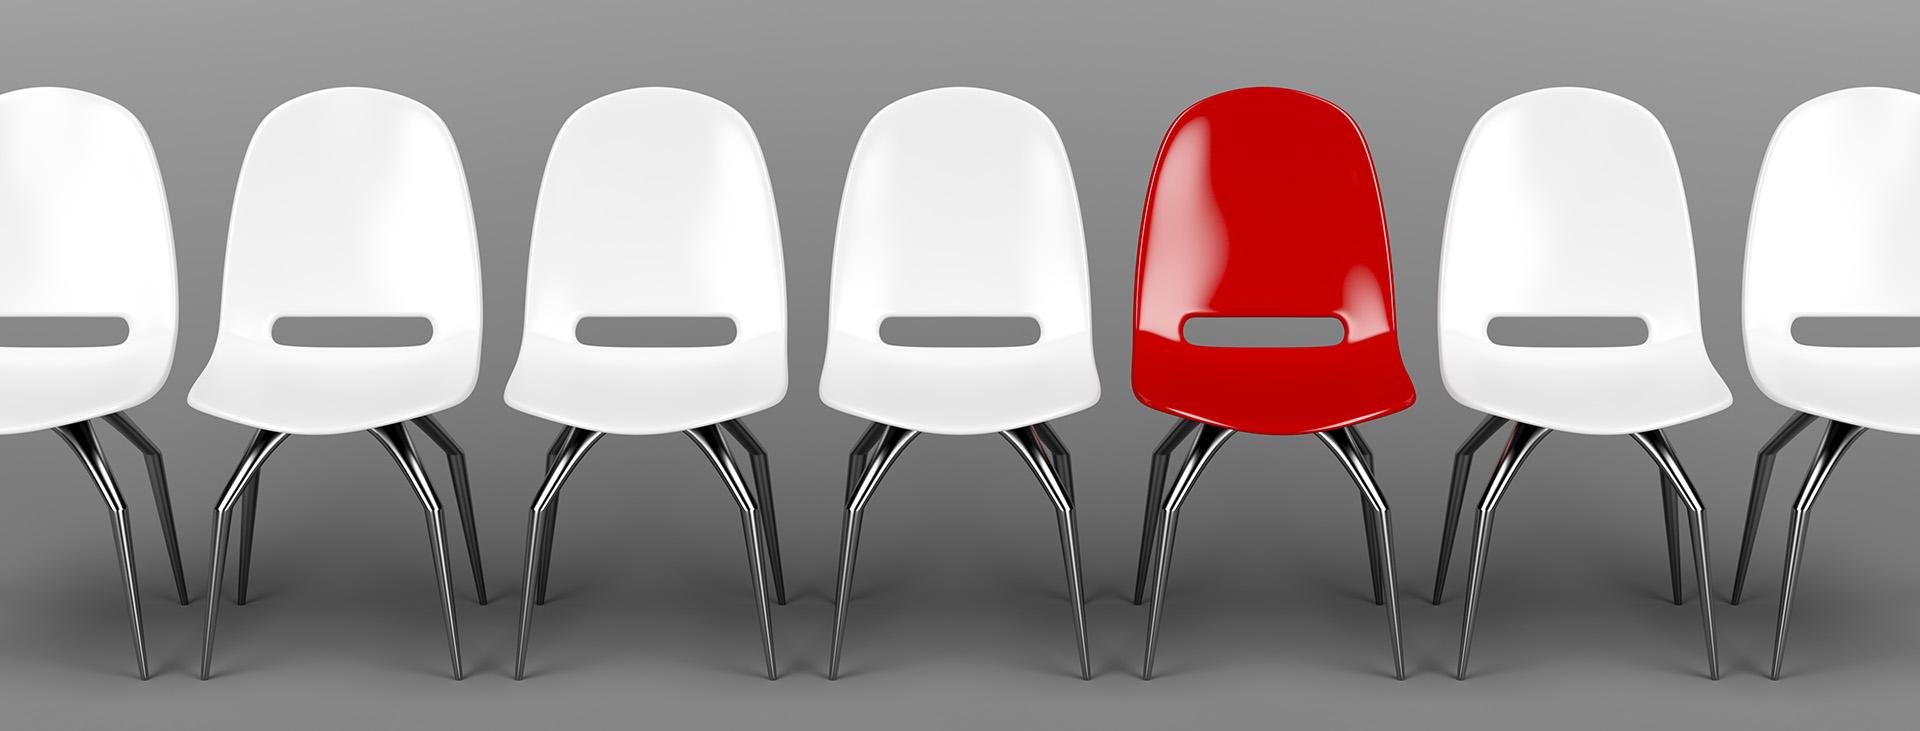 Unique red chair